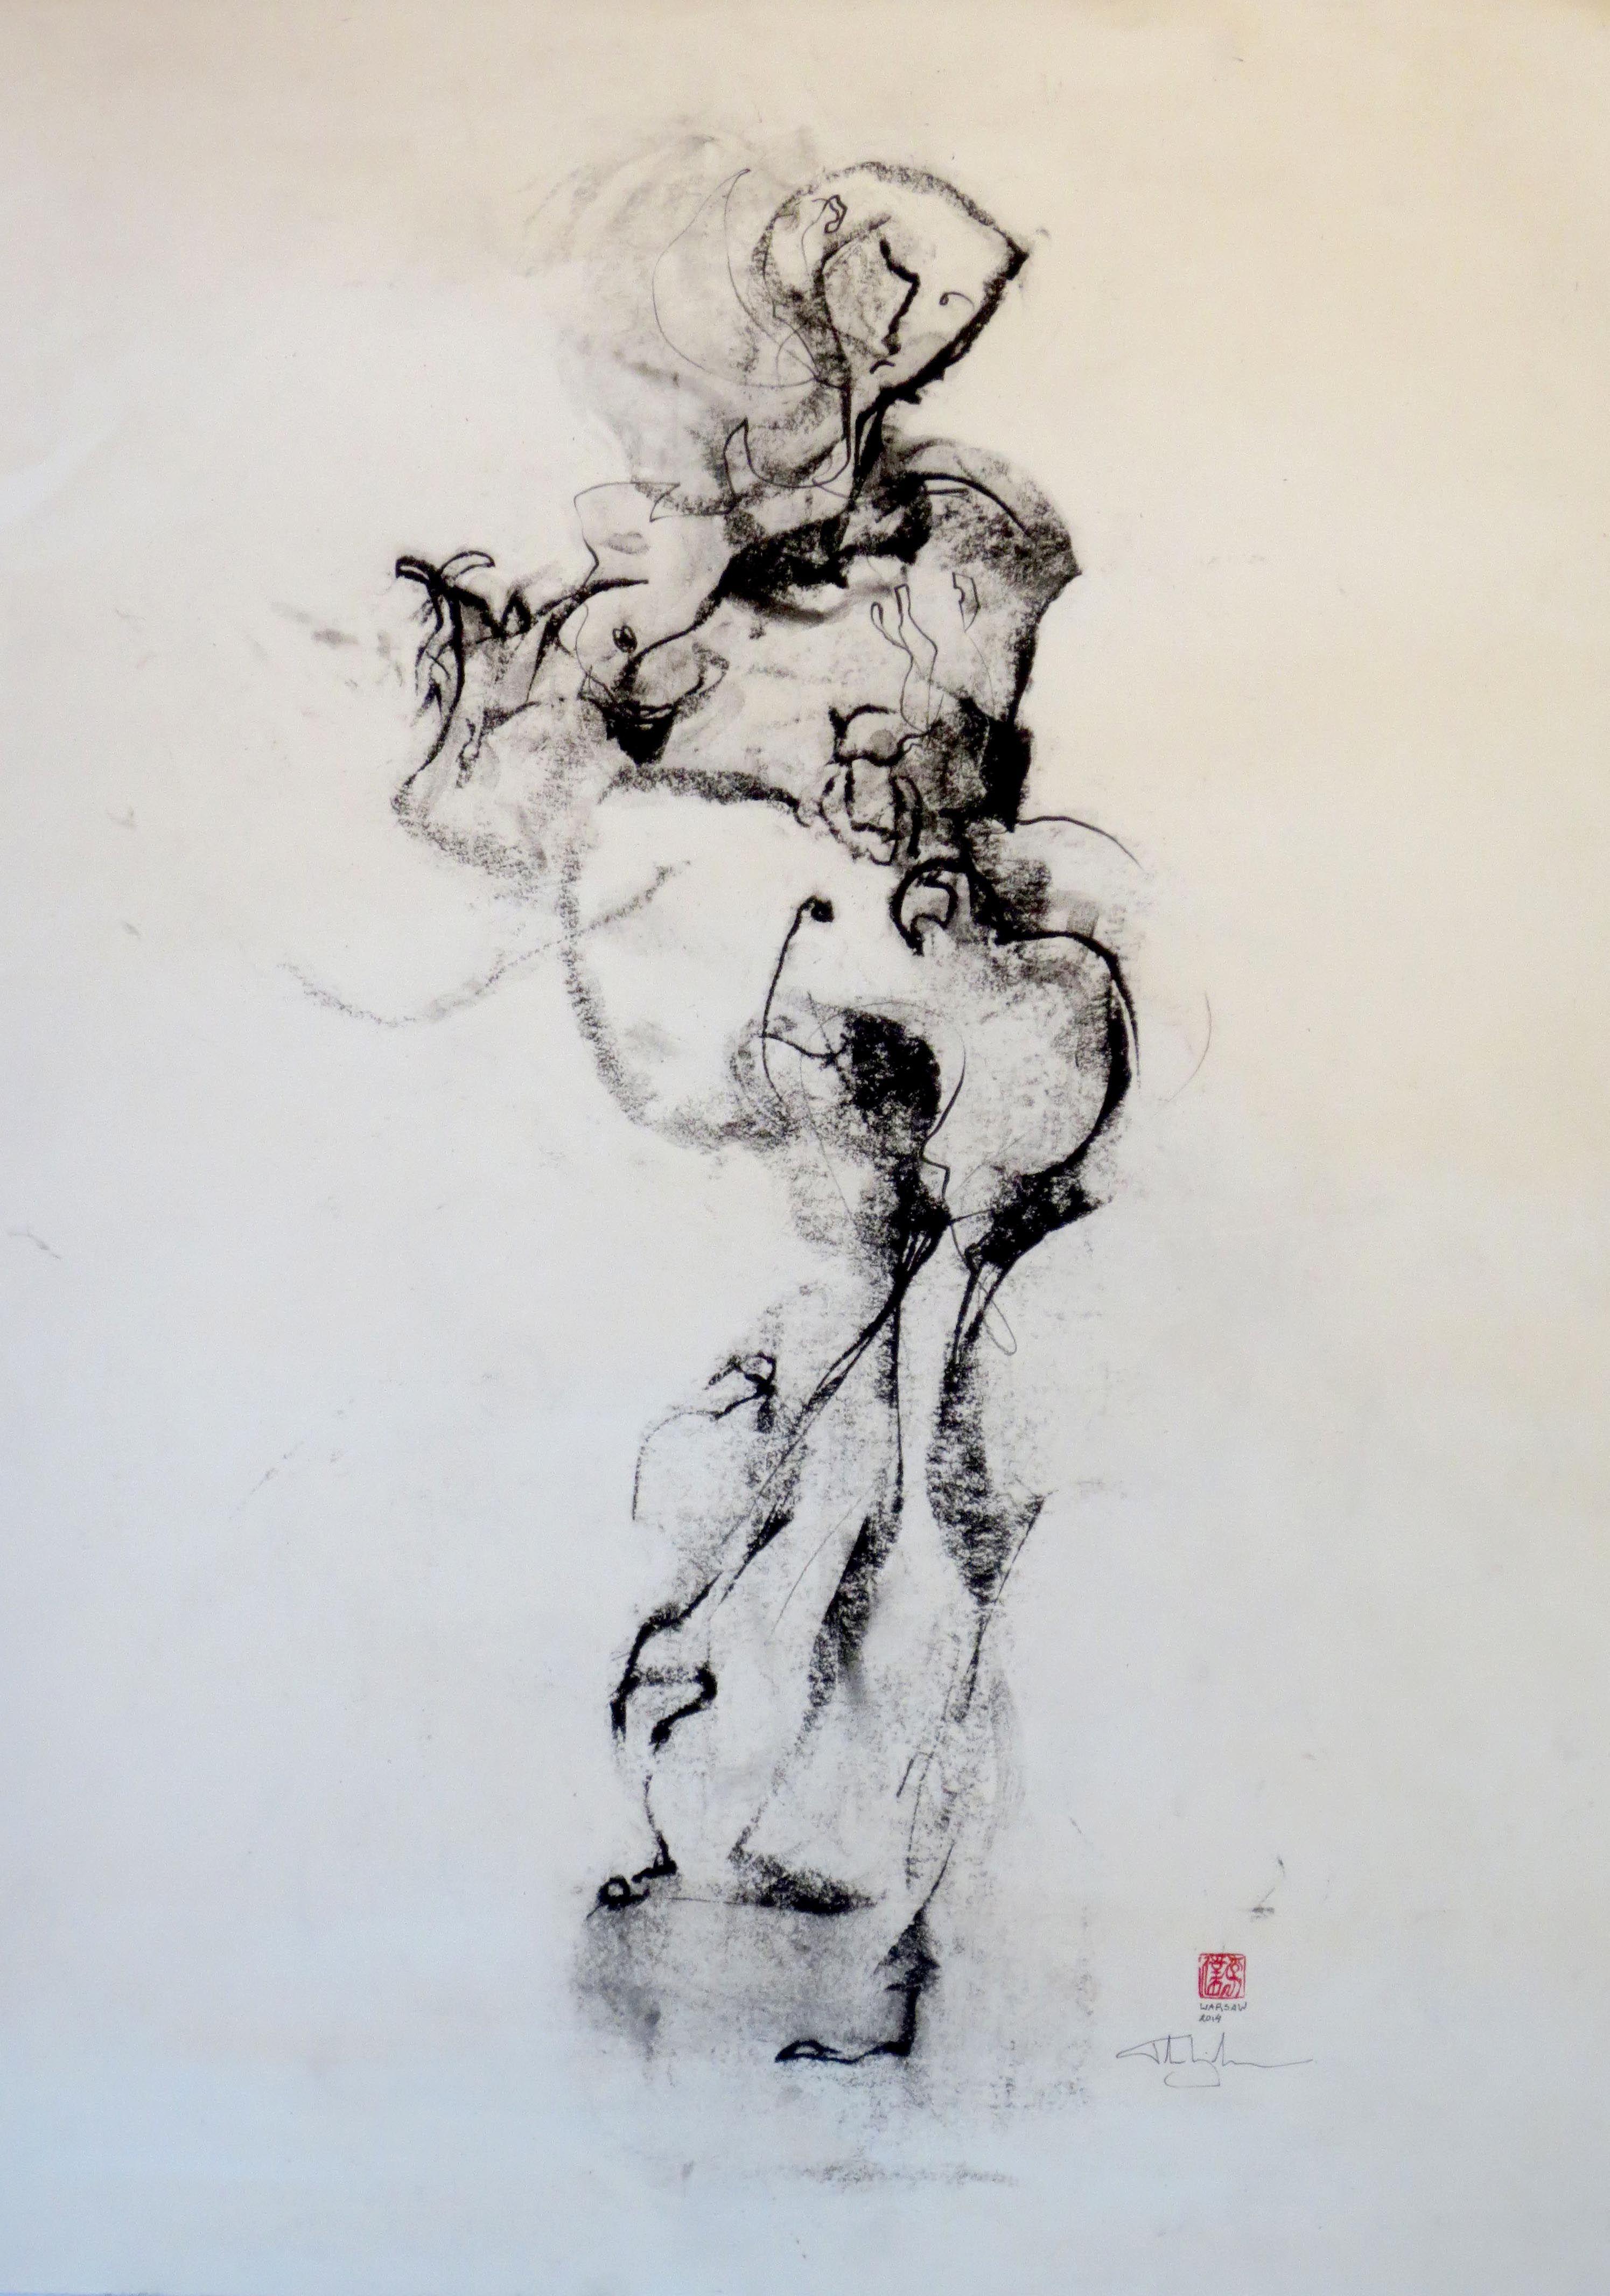 John Ligda Of Woman And Beast For The Love Of Man Art Art